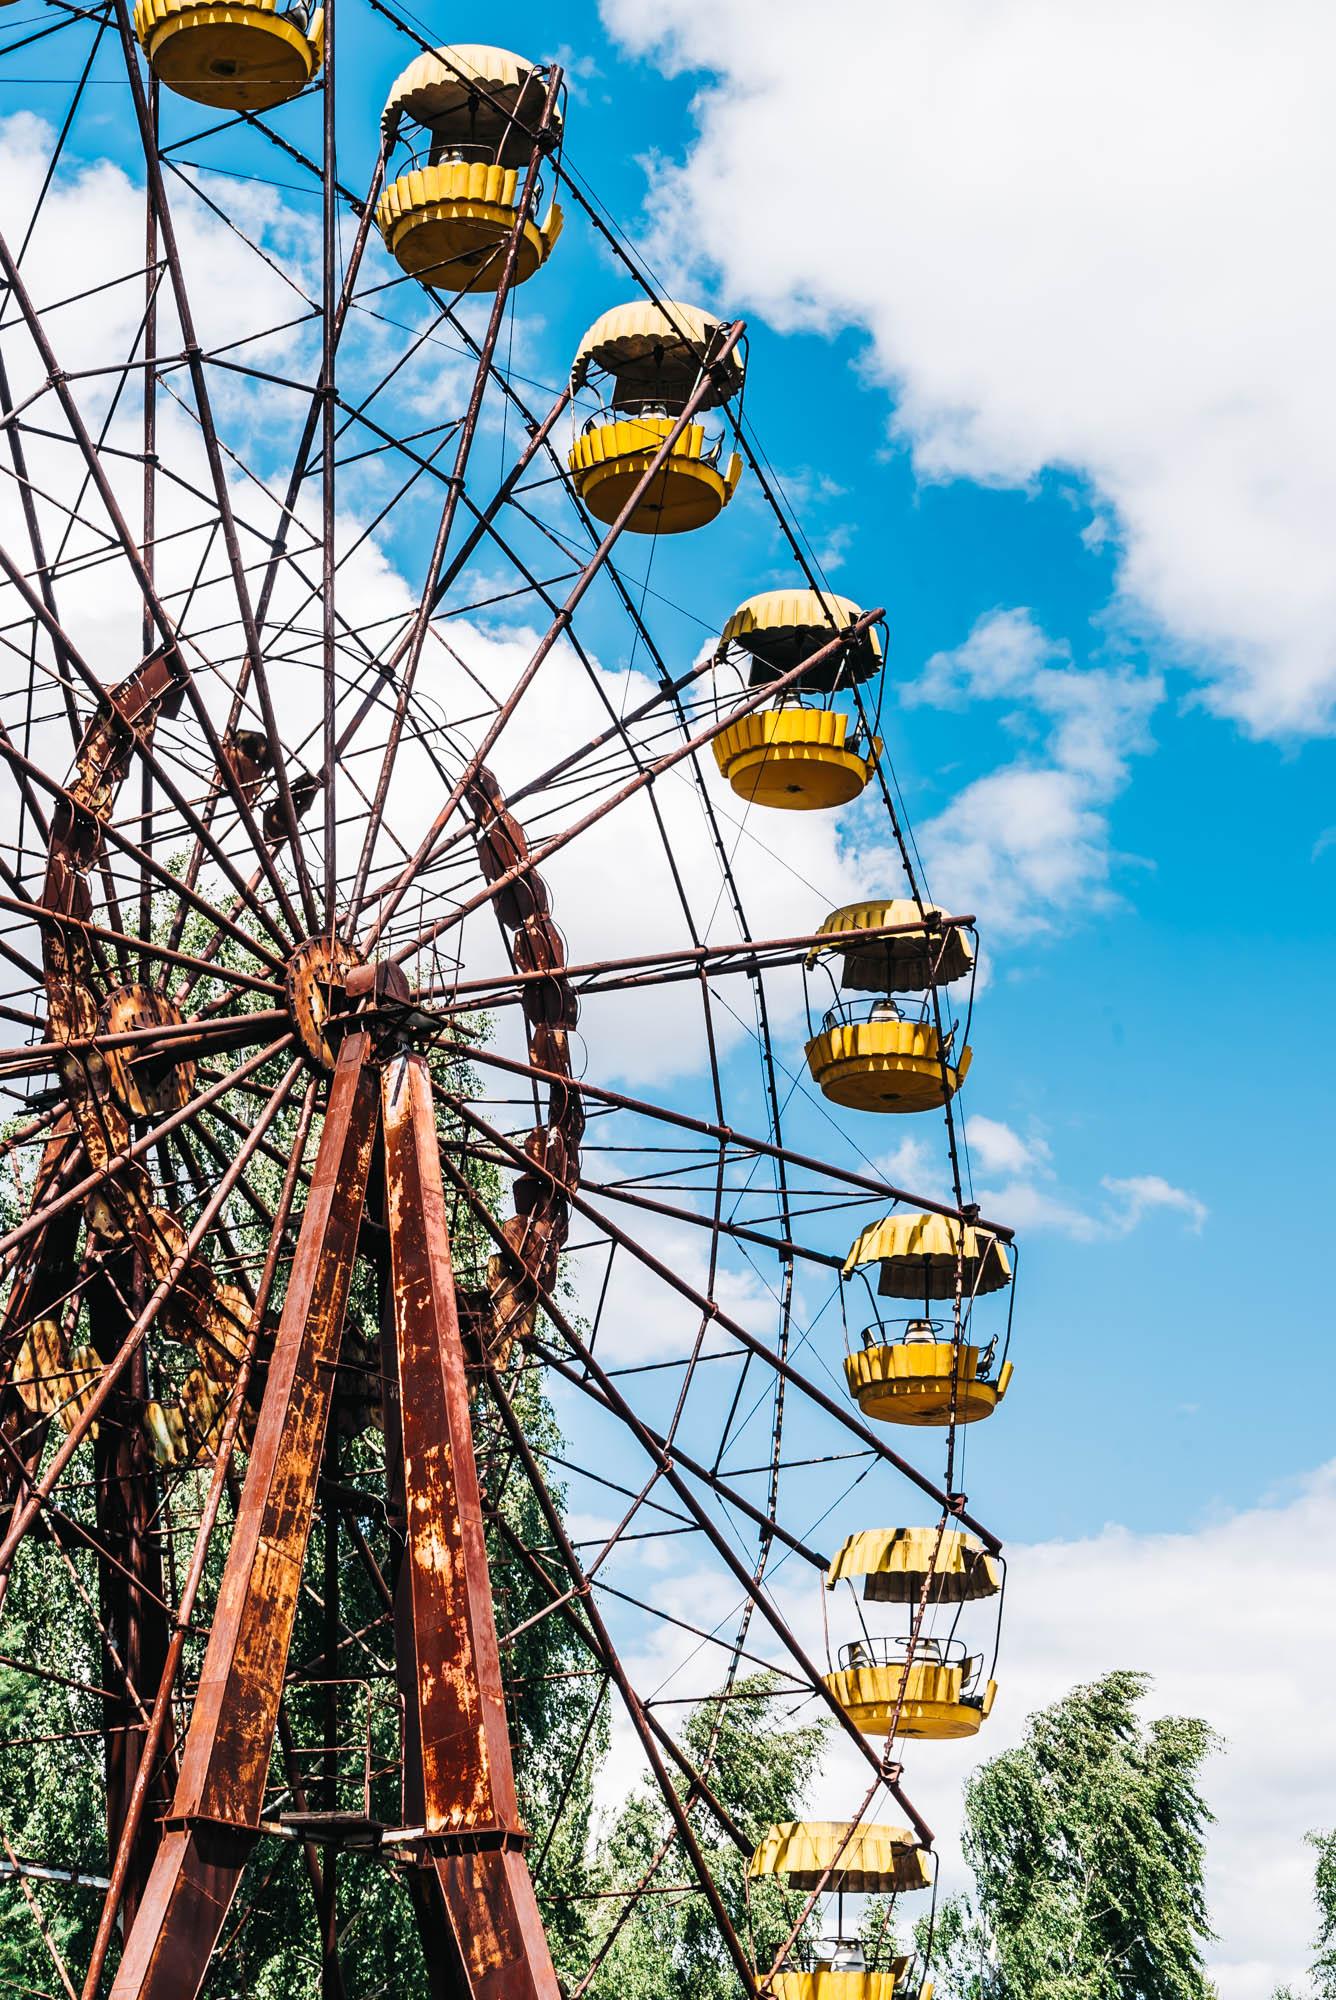 The iconic ferris wheel of Pripyat